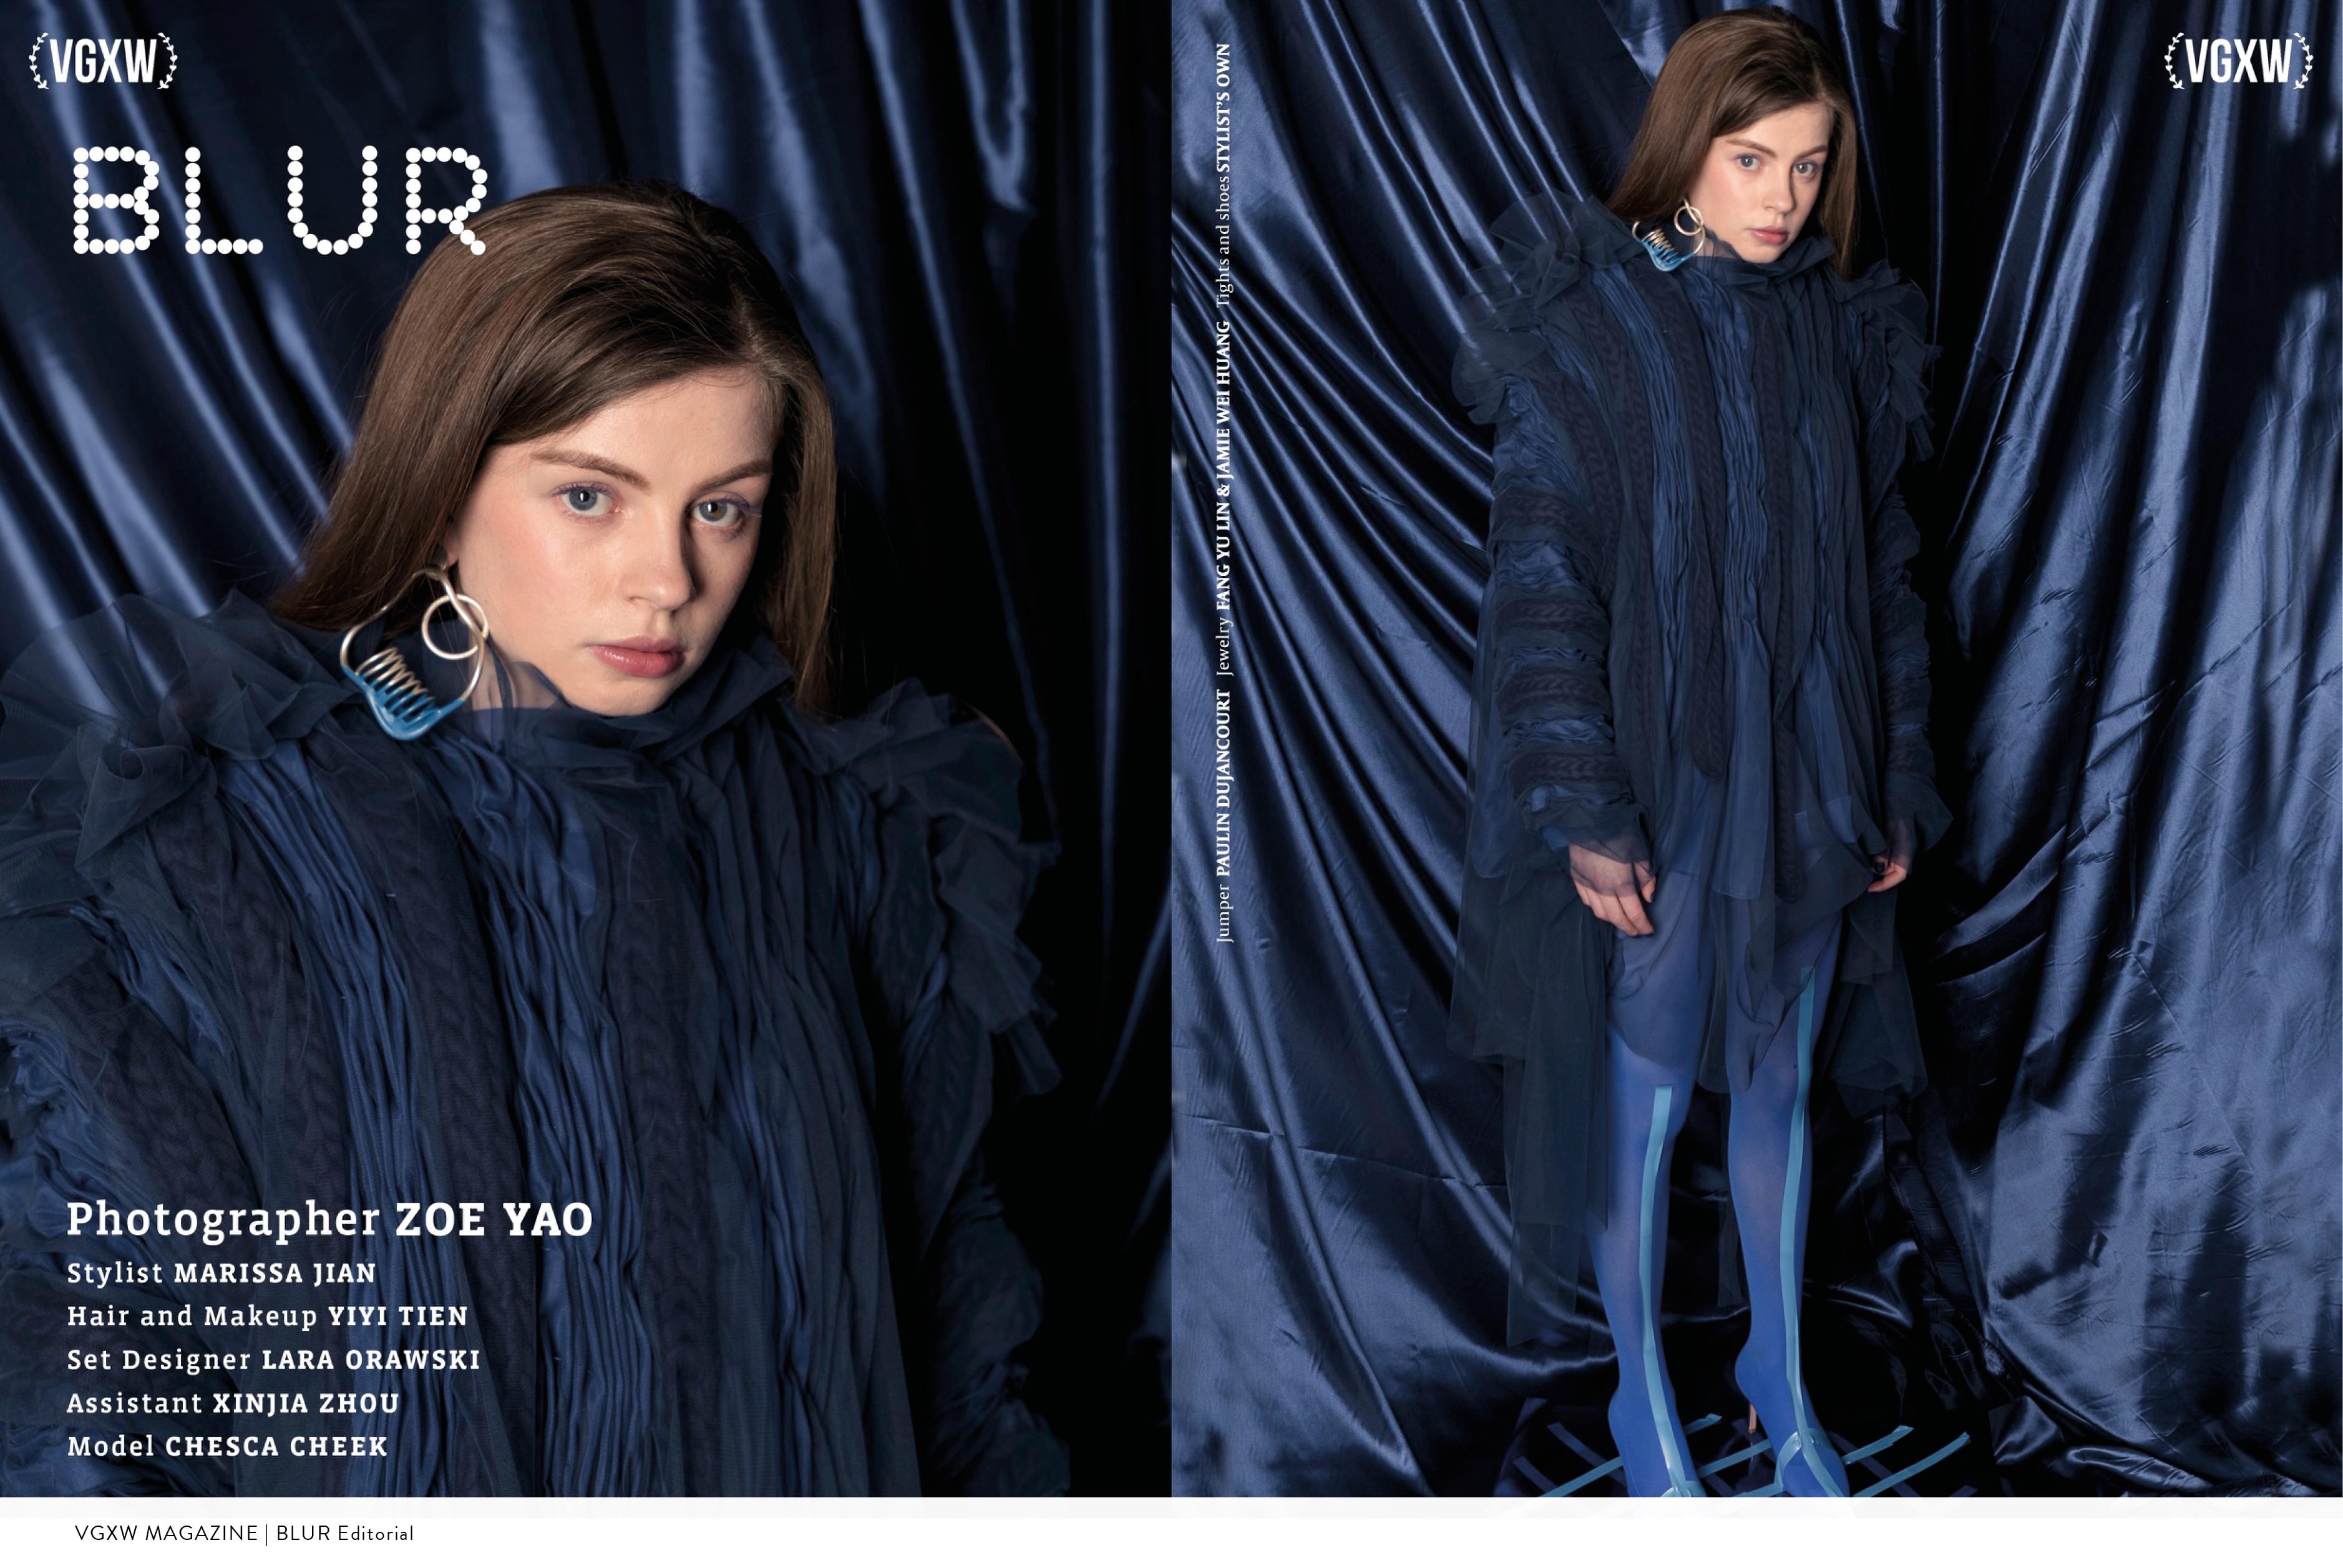 VGXW Magazine | BLUR Editorial